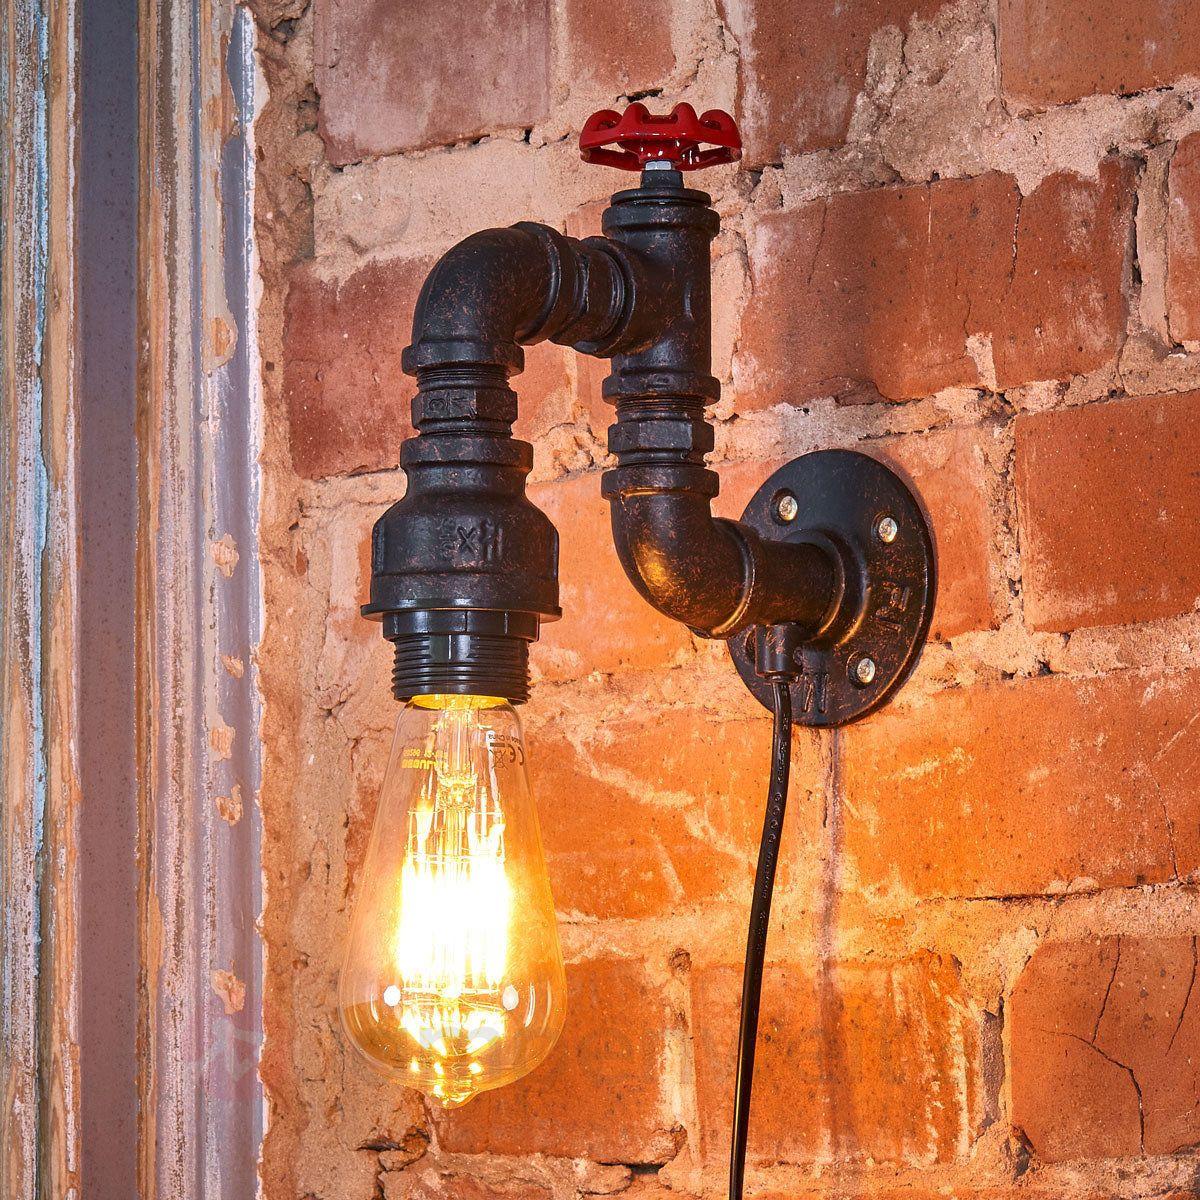 Wandlampe Tap Wasserhahn Wasserrohr 1-flammig Wandleuchte Antik Vintage Loft E27